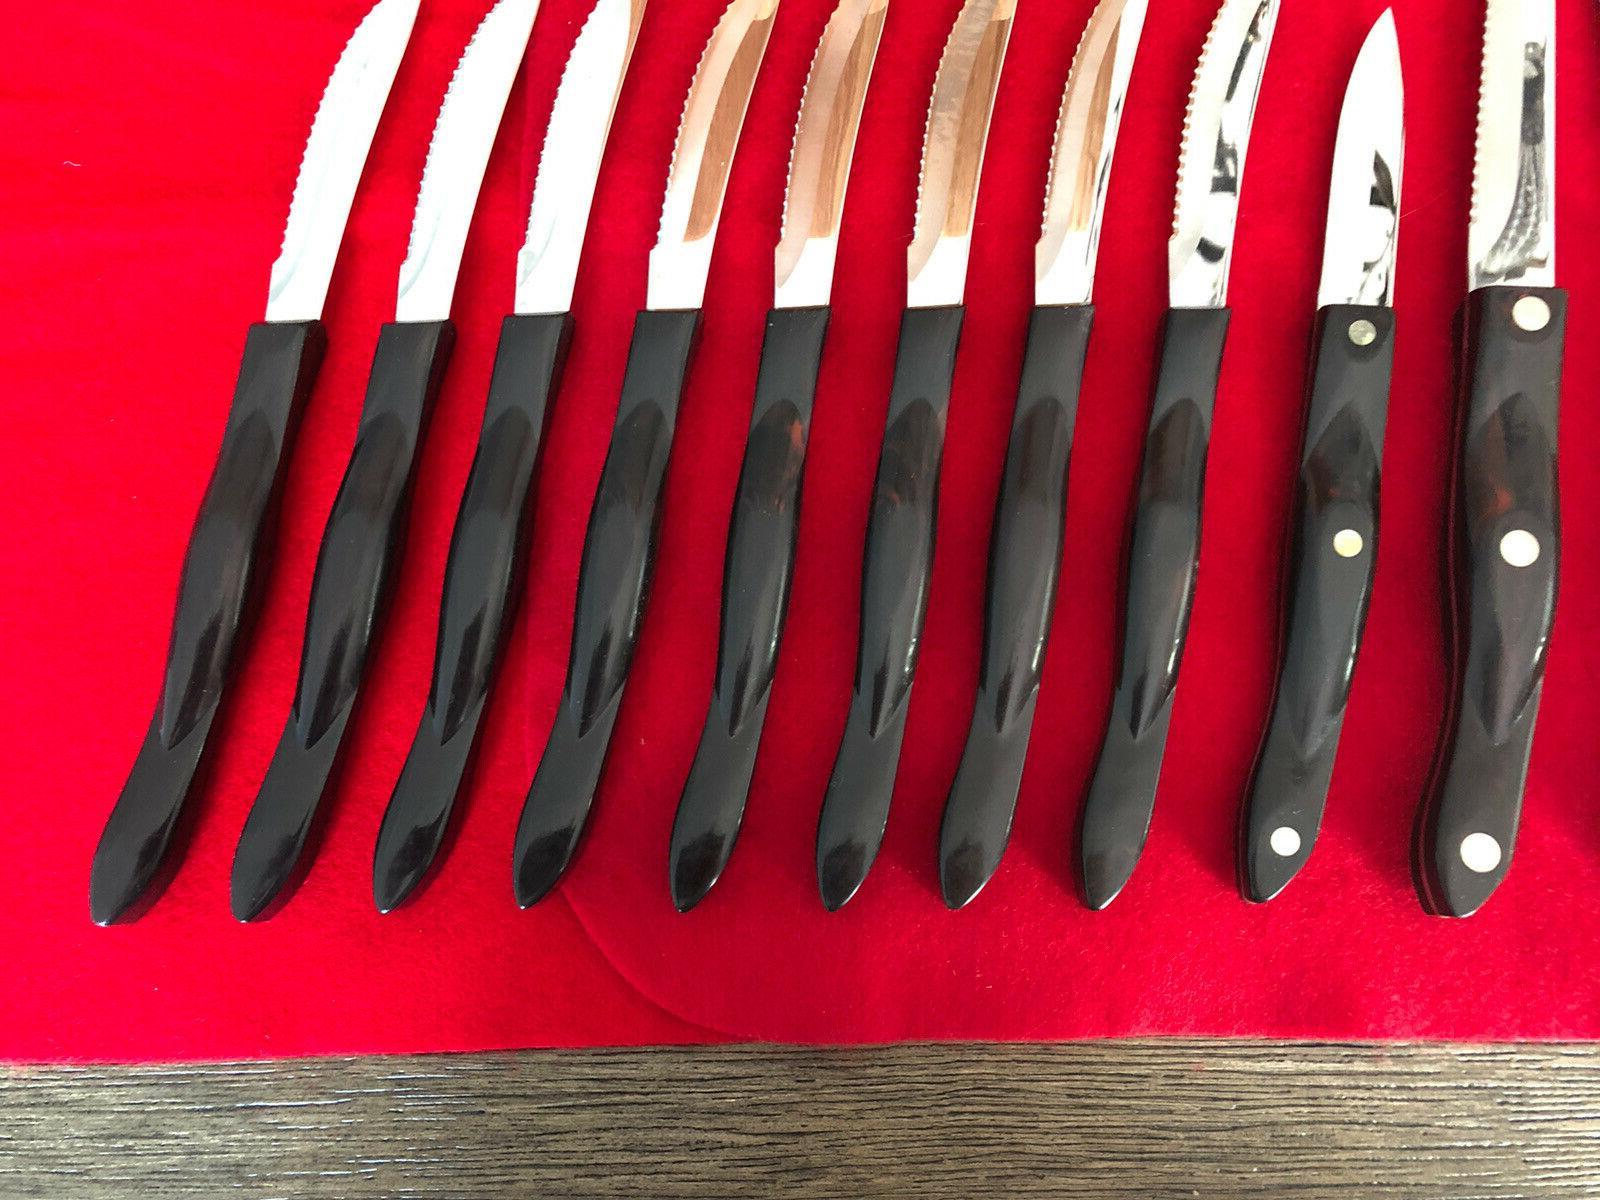 BEAUTIFUL HOMEMAKER 8 KNIFE SET WITH HONEY OAK